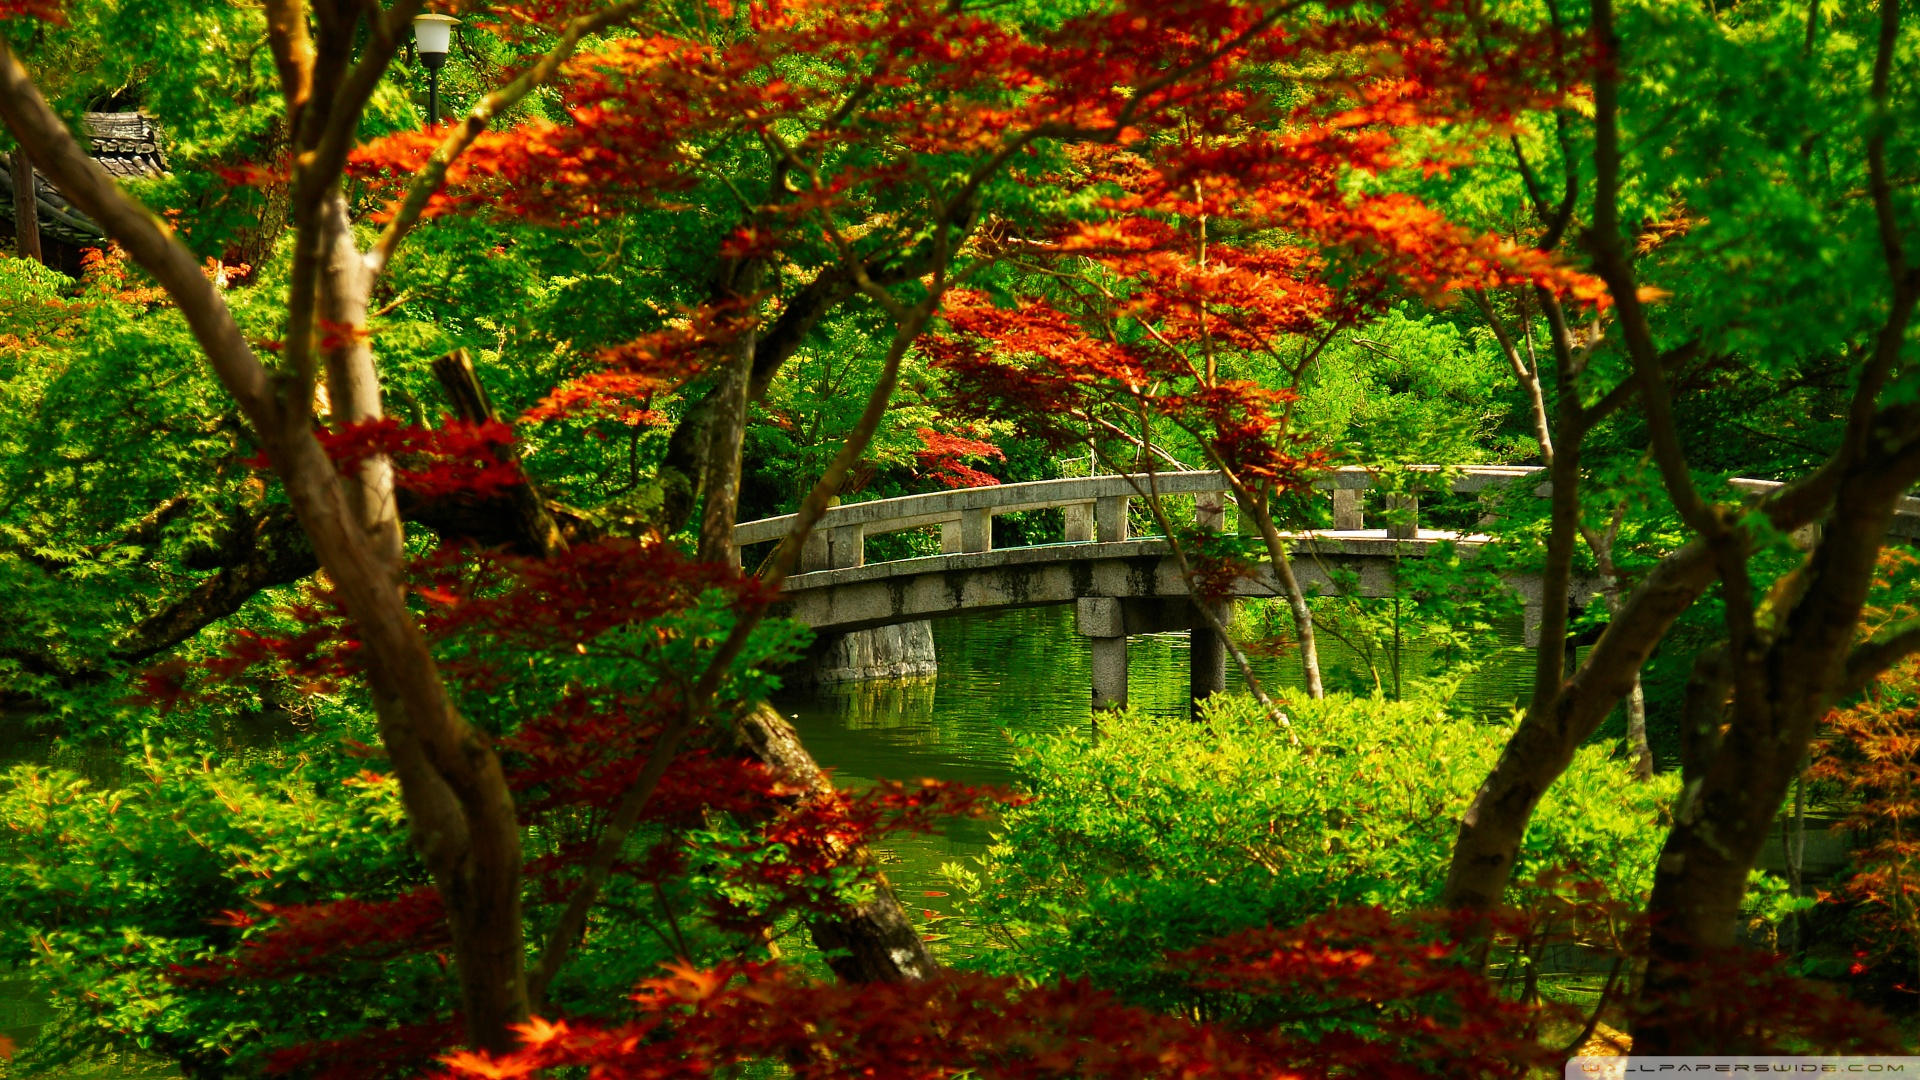 Japanese Garden Kyoto Wallpaper 1920x1080 Japanese Garden Kyoto 1920x1080